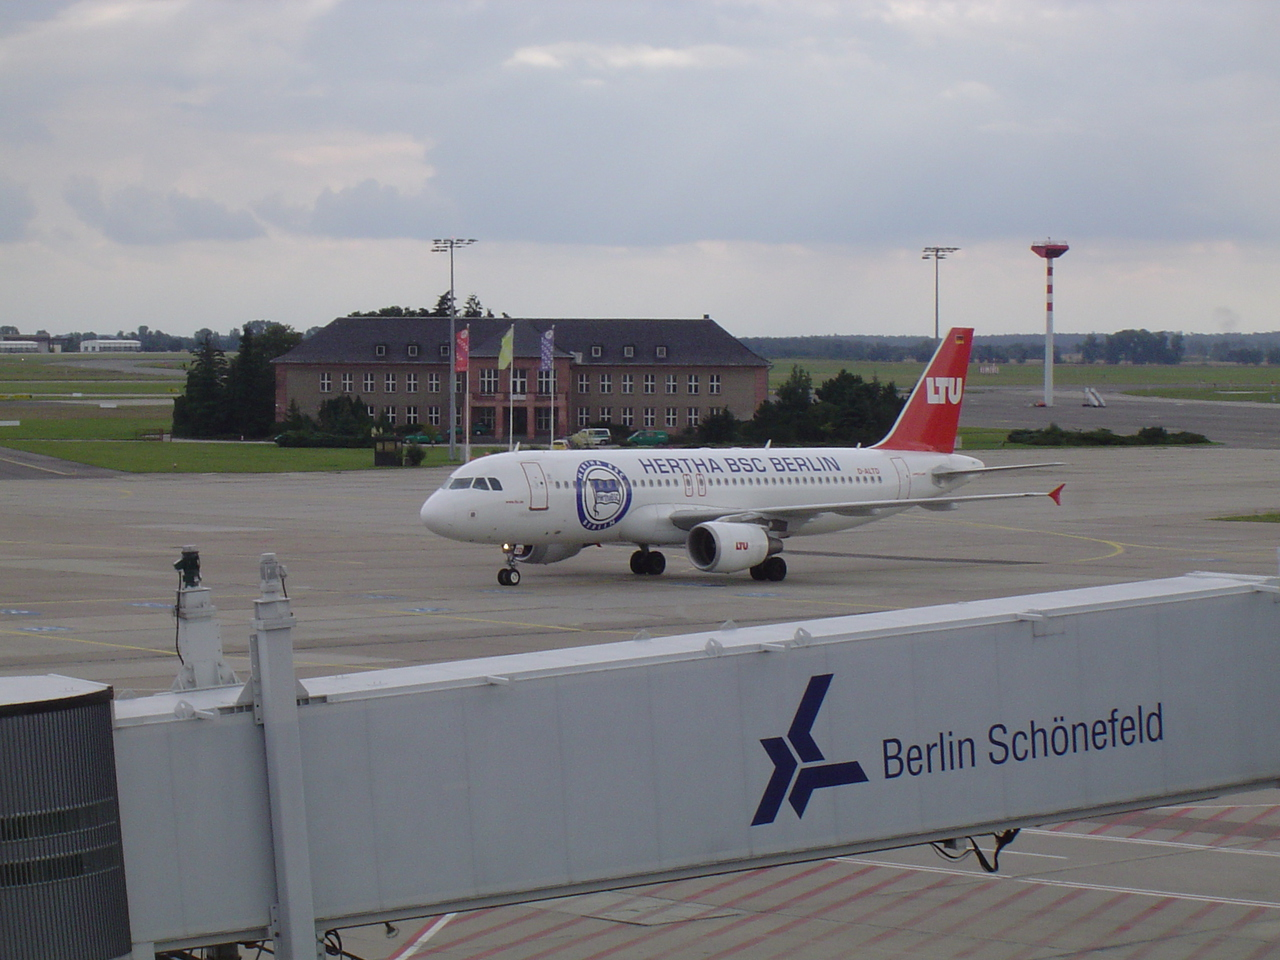 airbusa320ltuherthabs33kvj.jpg